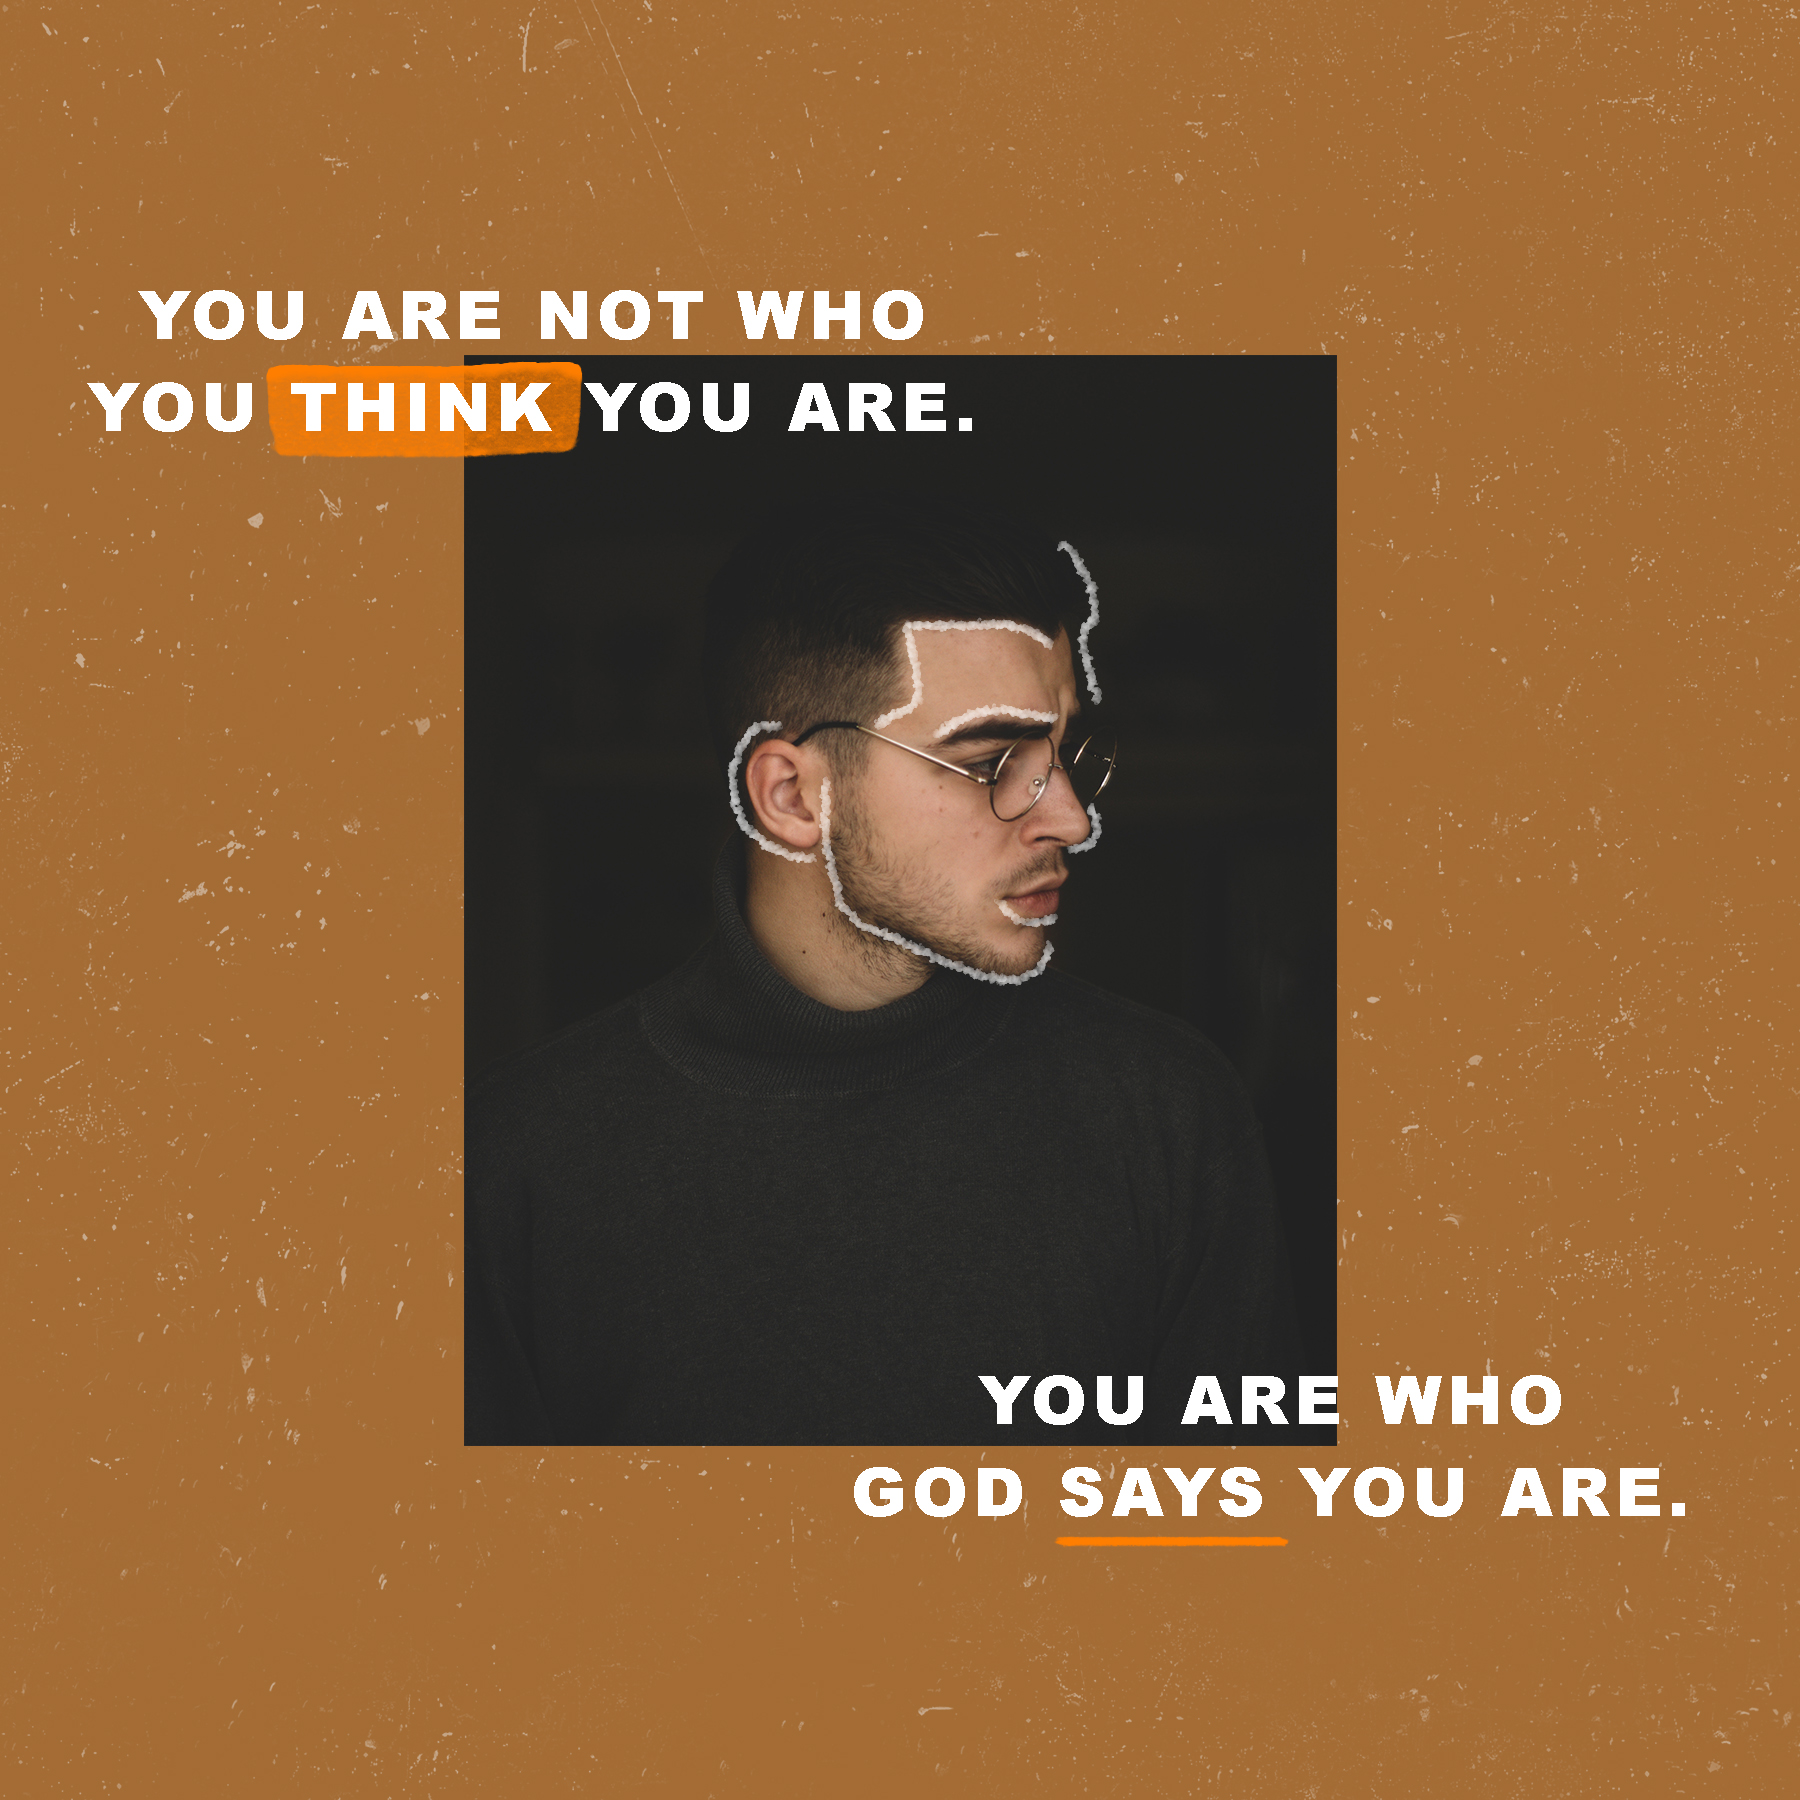 God_says.jpg